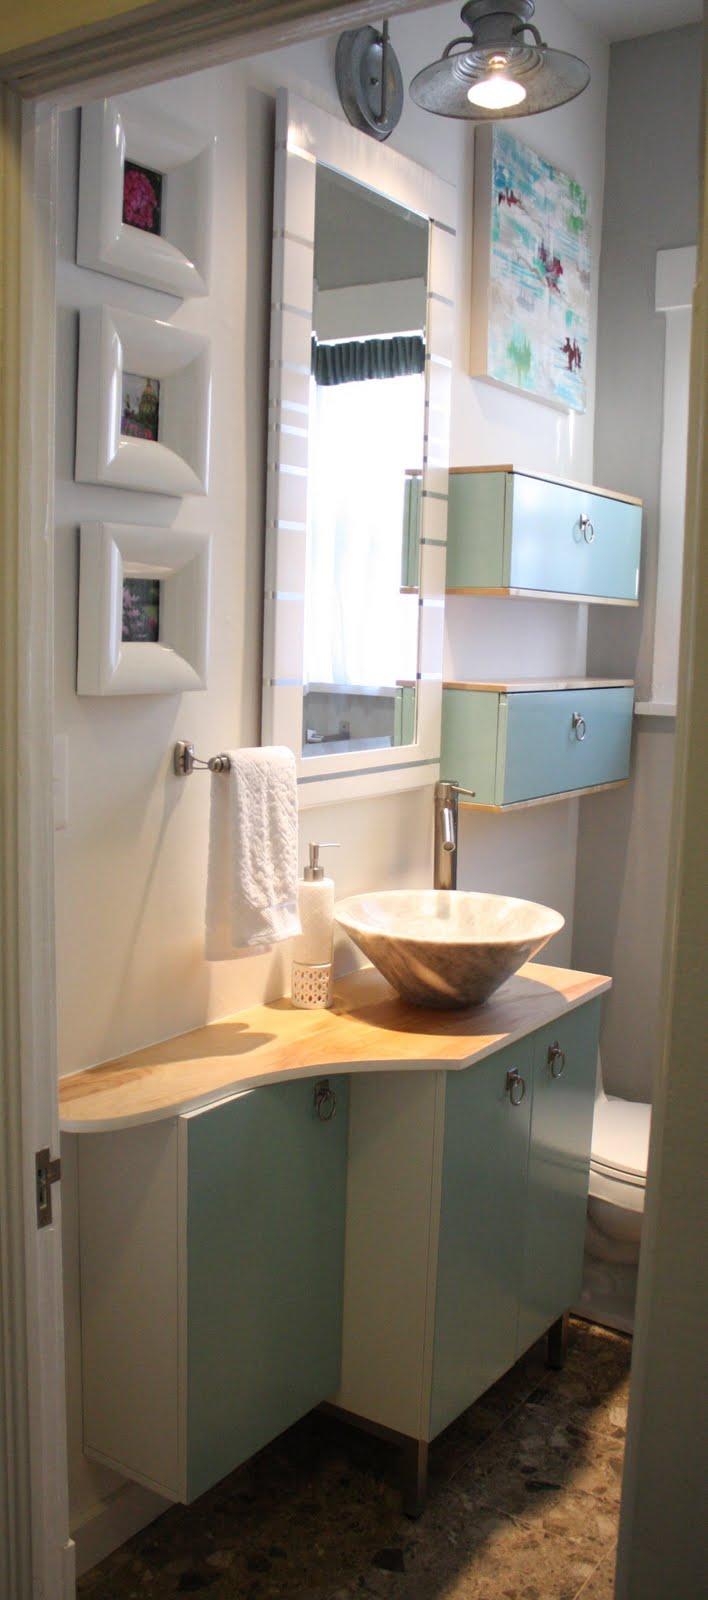 Ikea bathroom remodel